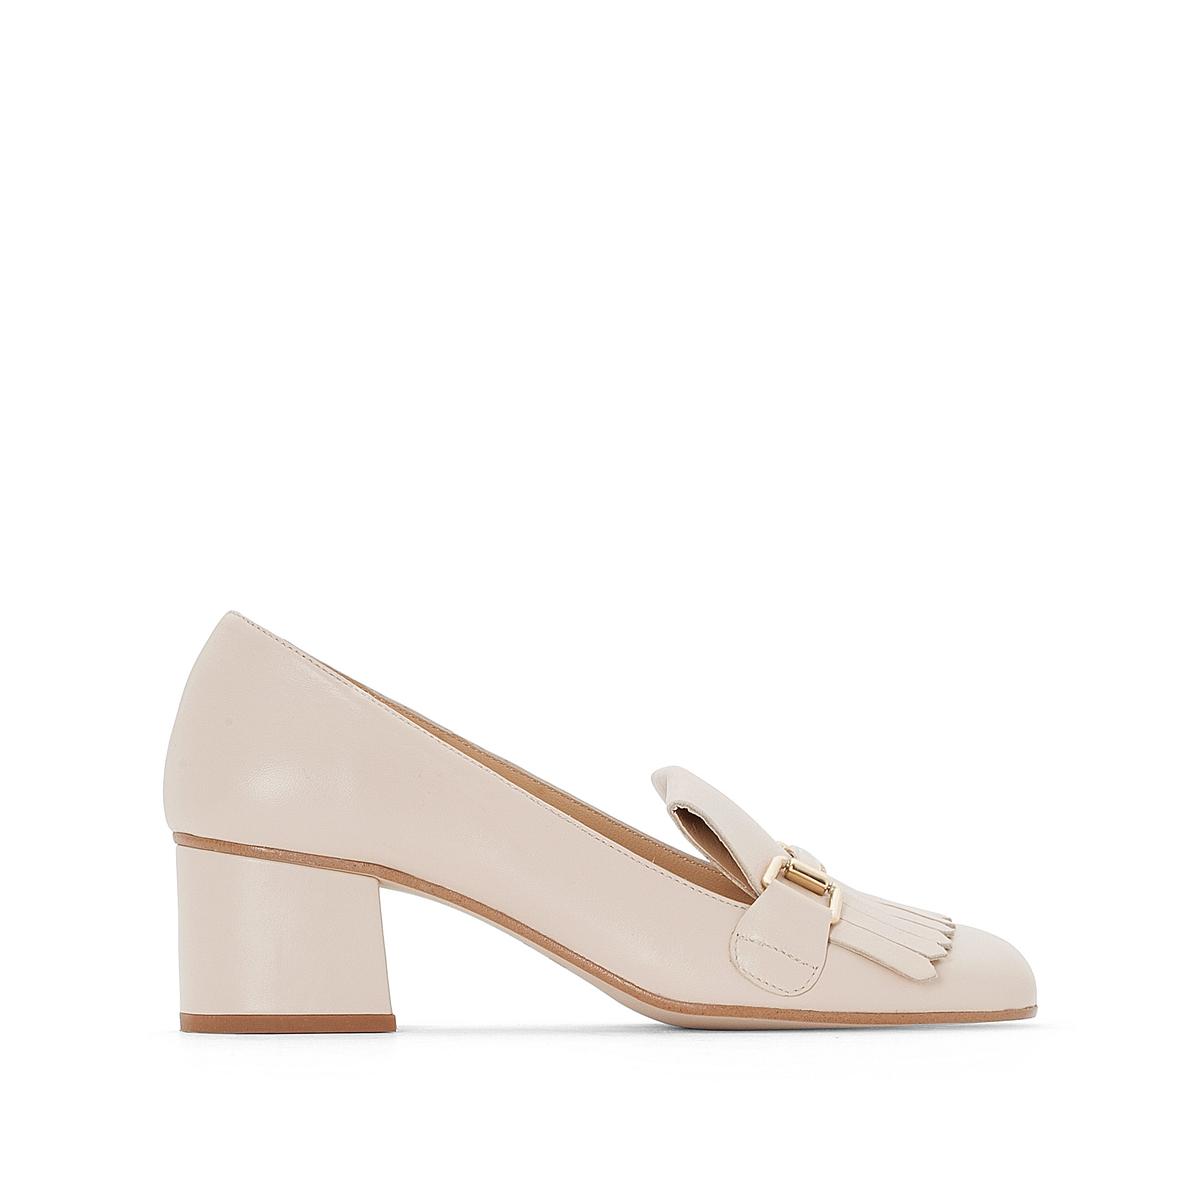 Туфли кожаные на широком каблуке, Valvi цены онлайн